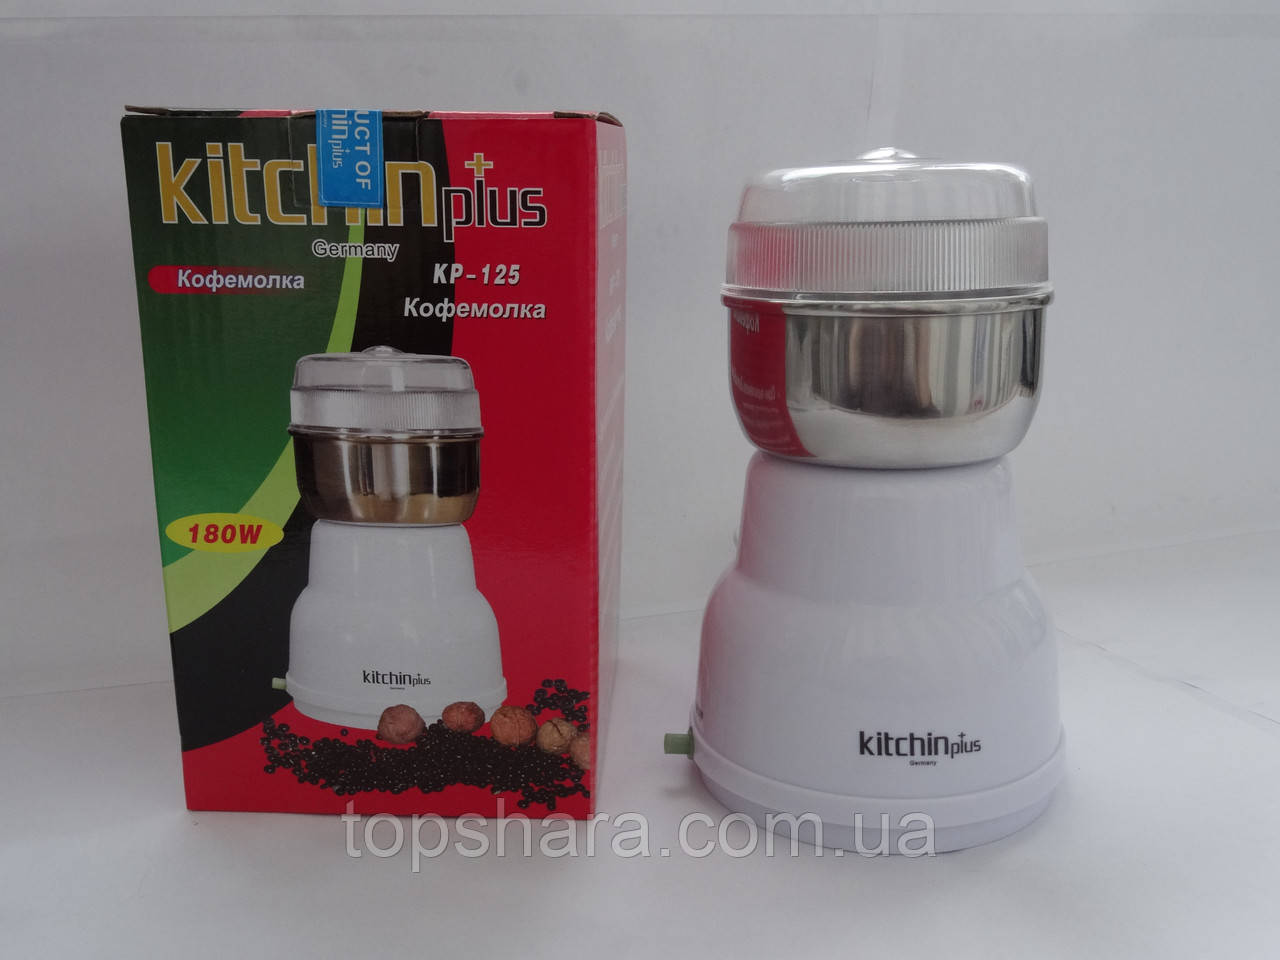 Кофемолка Kitchin Plus KP-125  180W